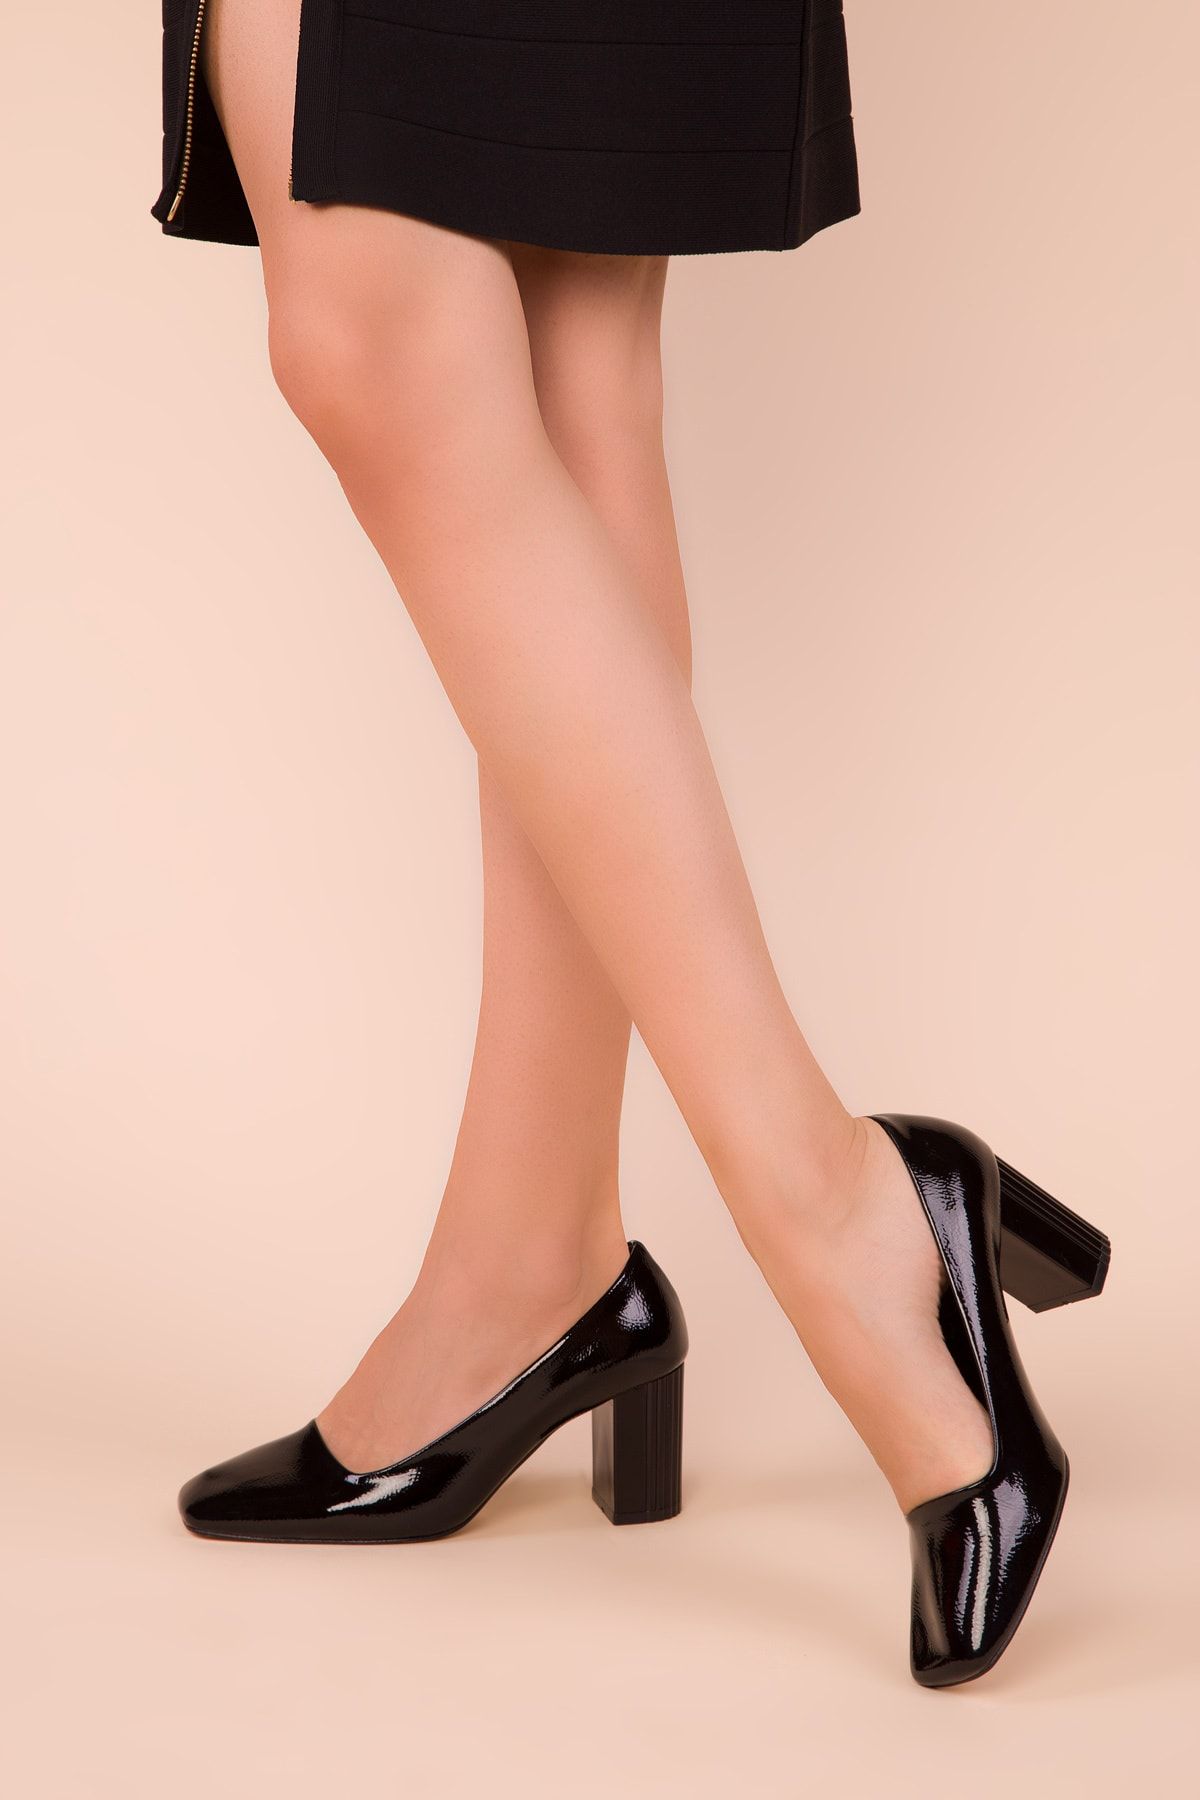 SOHO Siyah Mat Rugan Kadın Klasik Topuklu Ayakkabı 15346 1